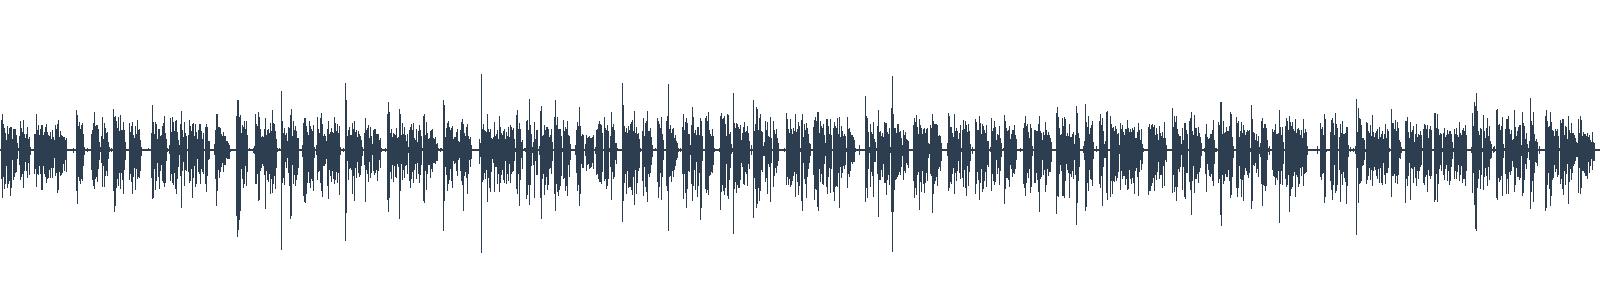 Denis McBride: Putovanie s Jonášom (3) waveform